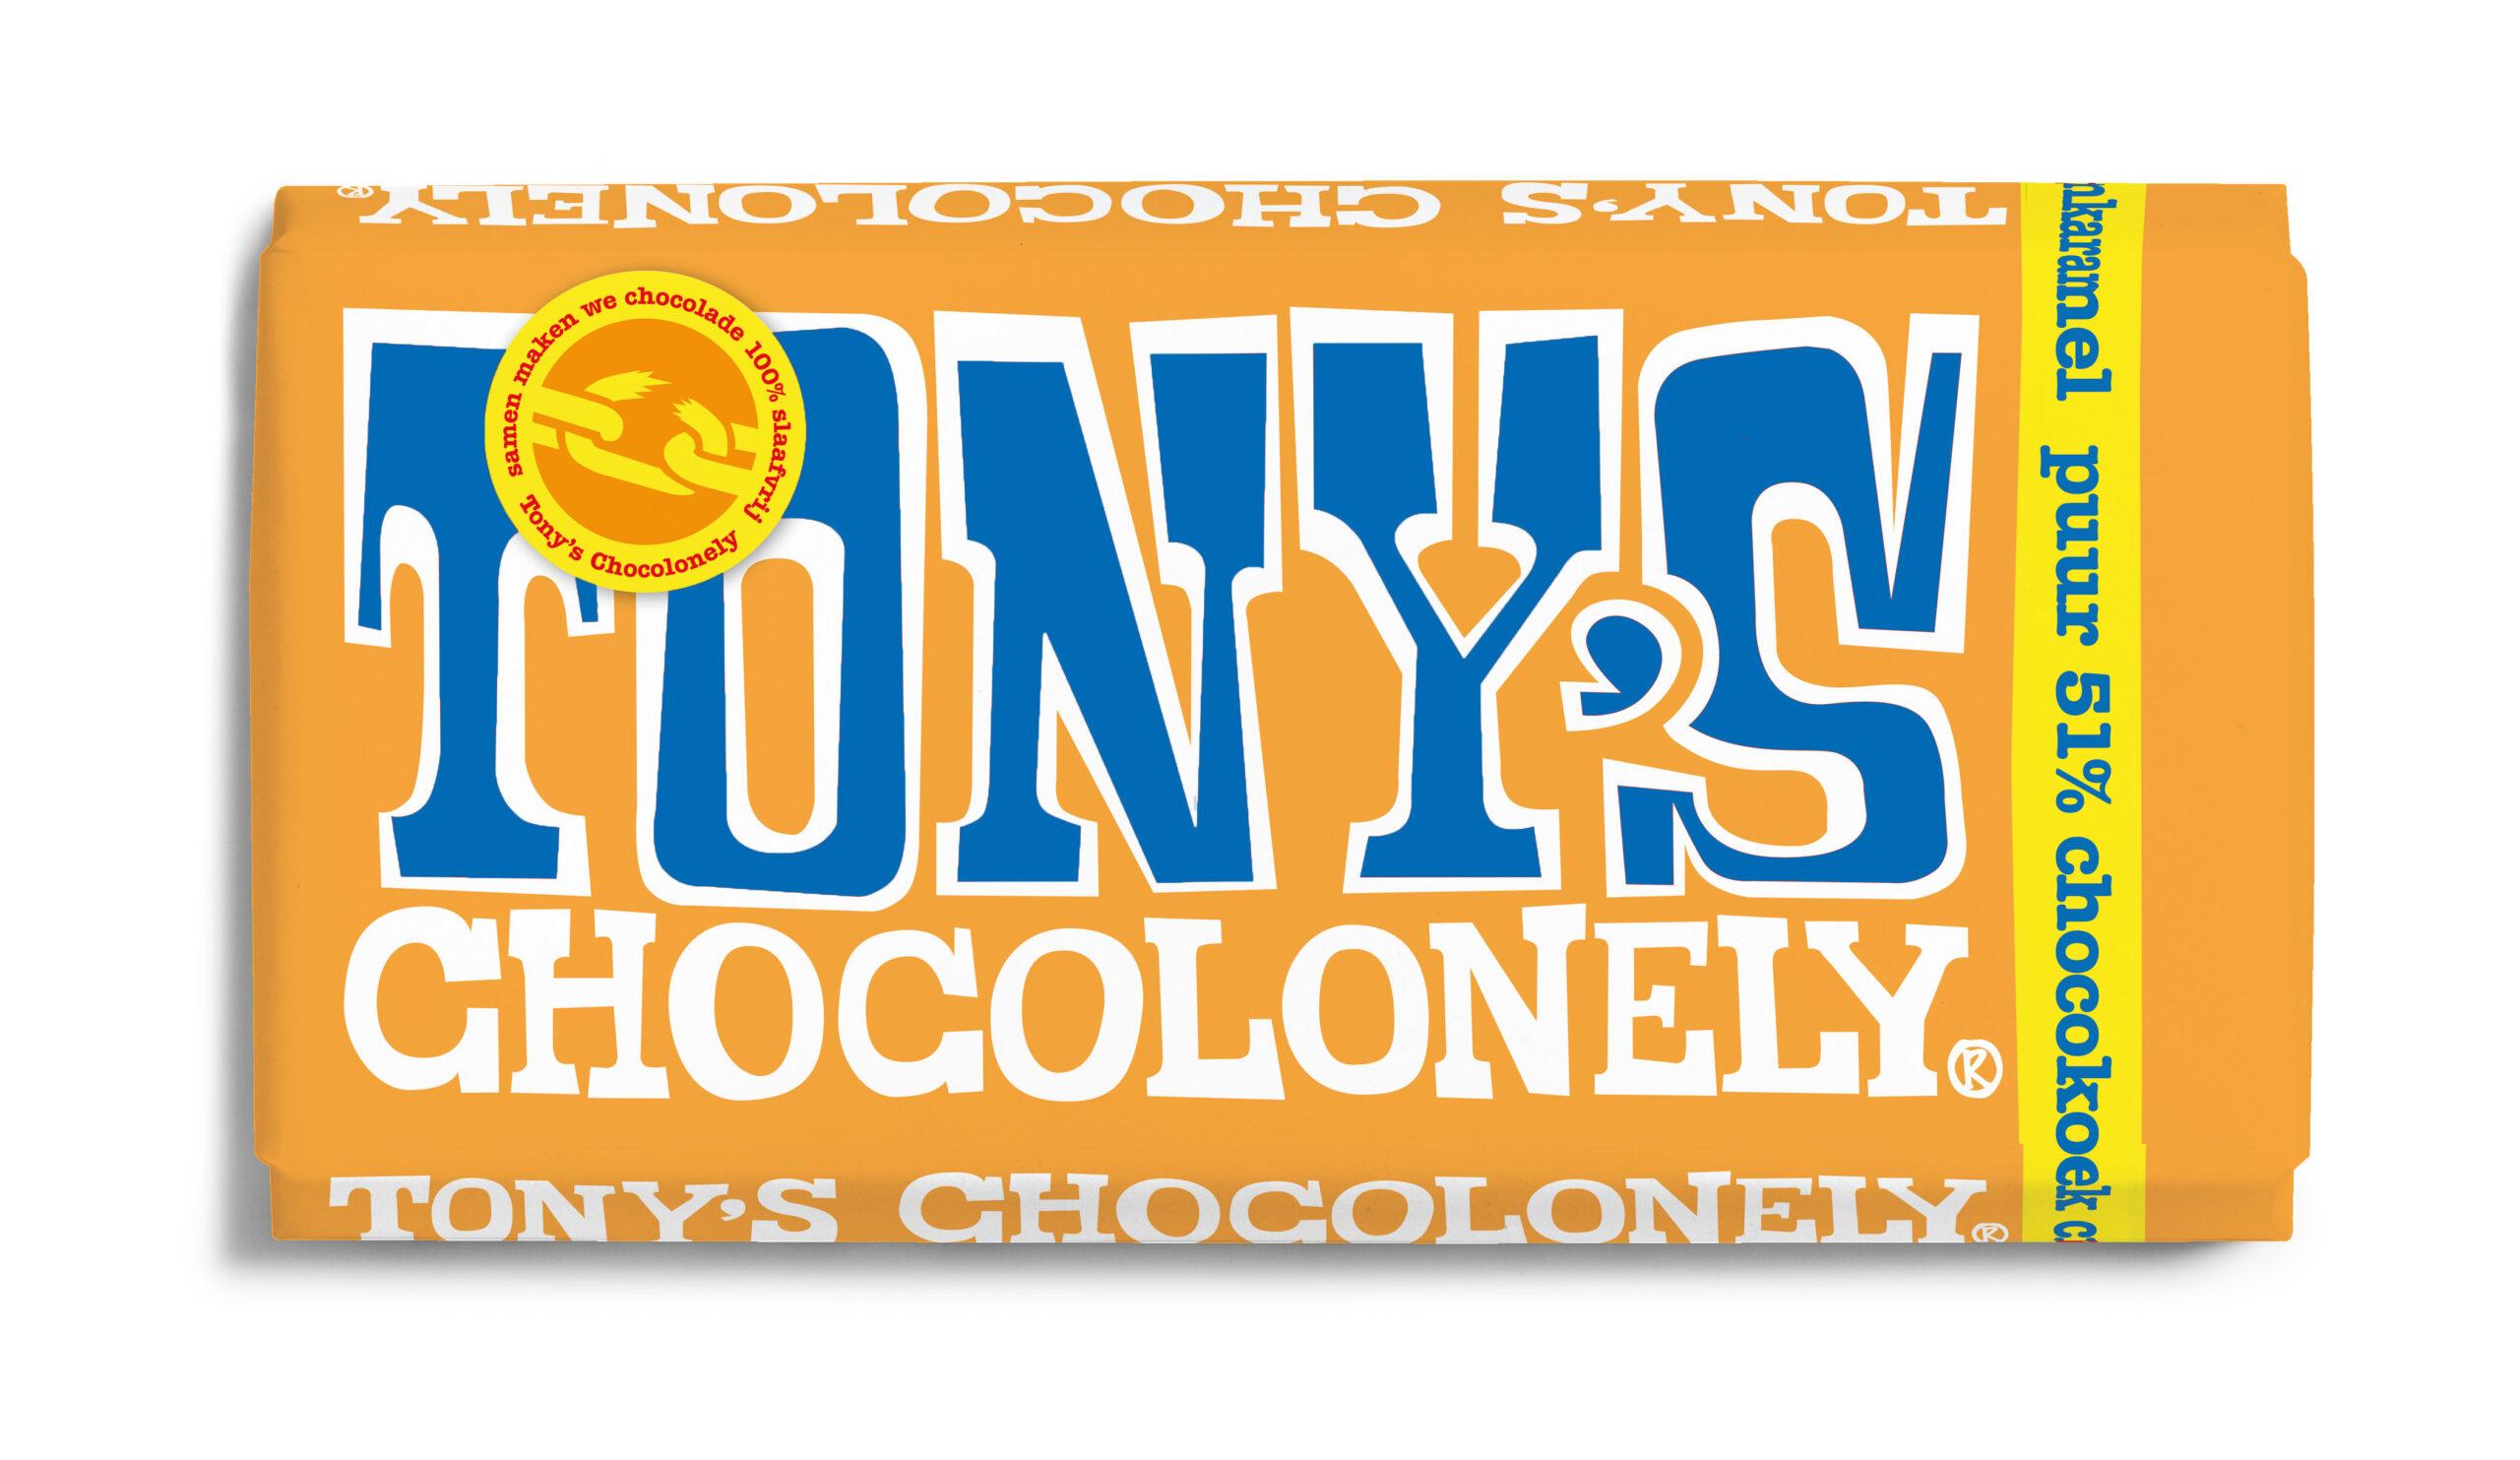 vegan tony's chocolonely puur chocokoek citroenkaramel